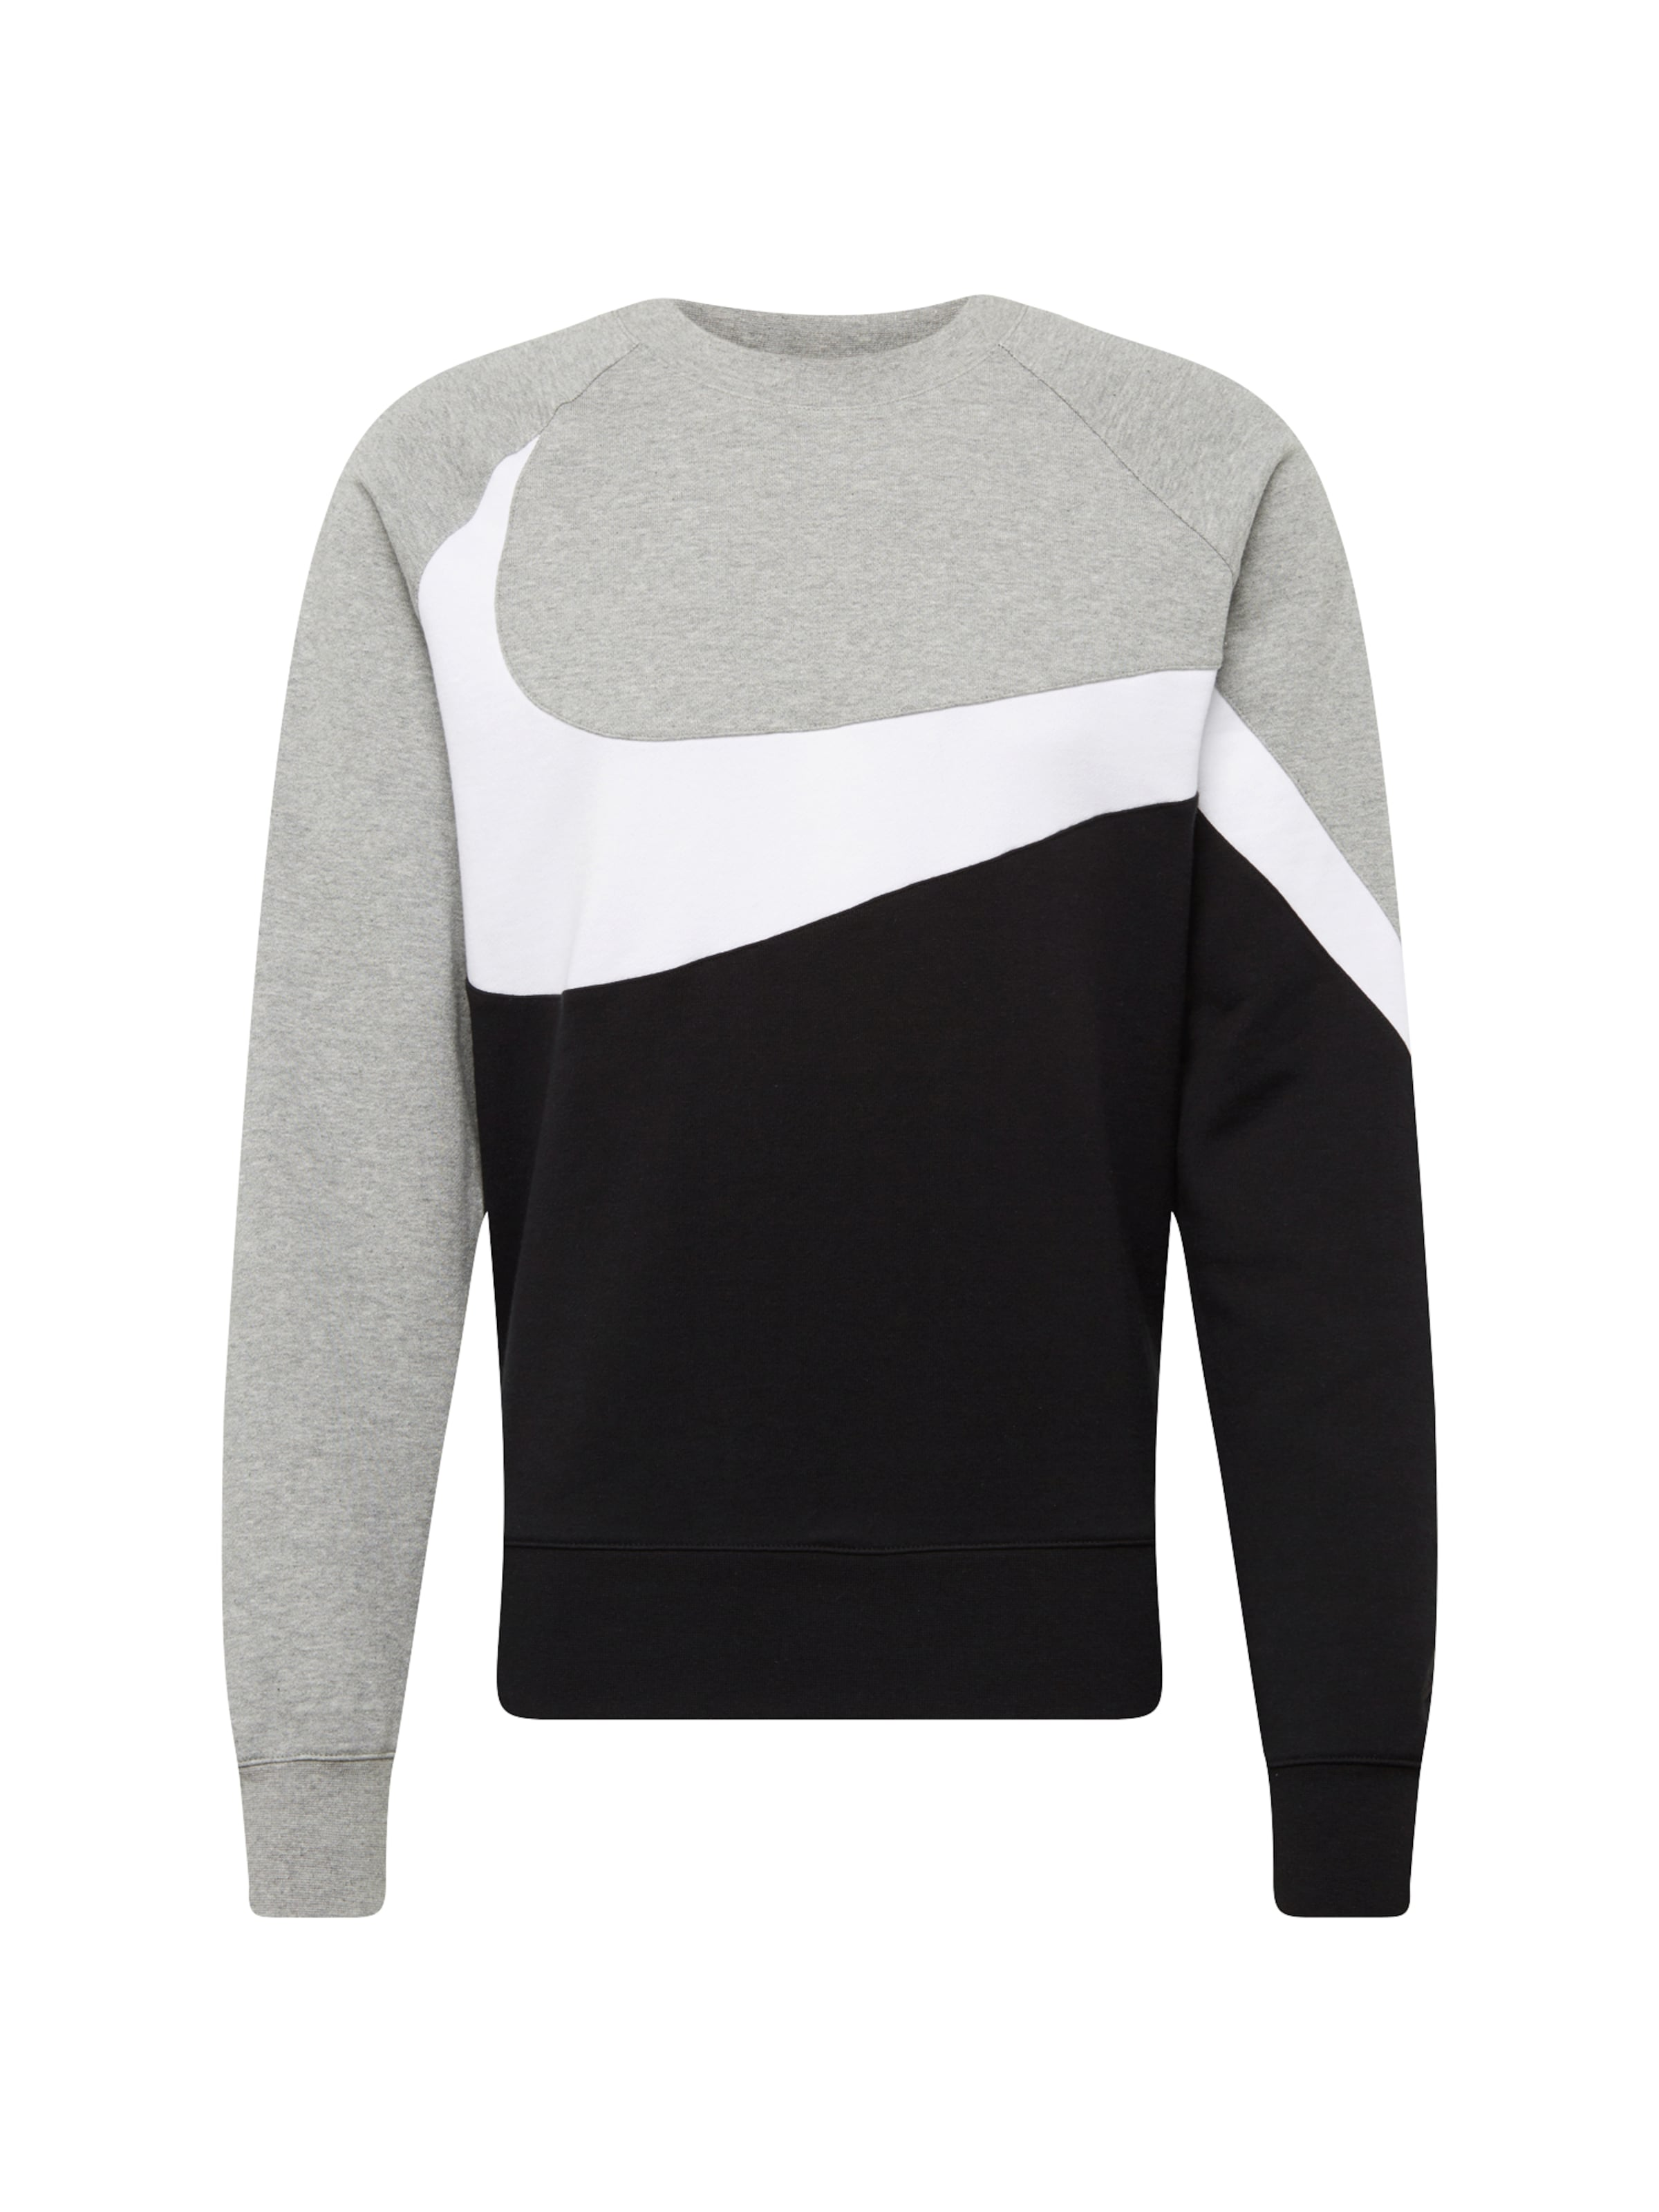 shirt Nike Sportswear Blanc Sweat GrisNoir En HY2IW9ED